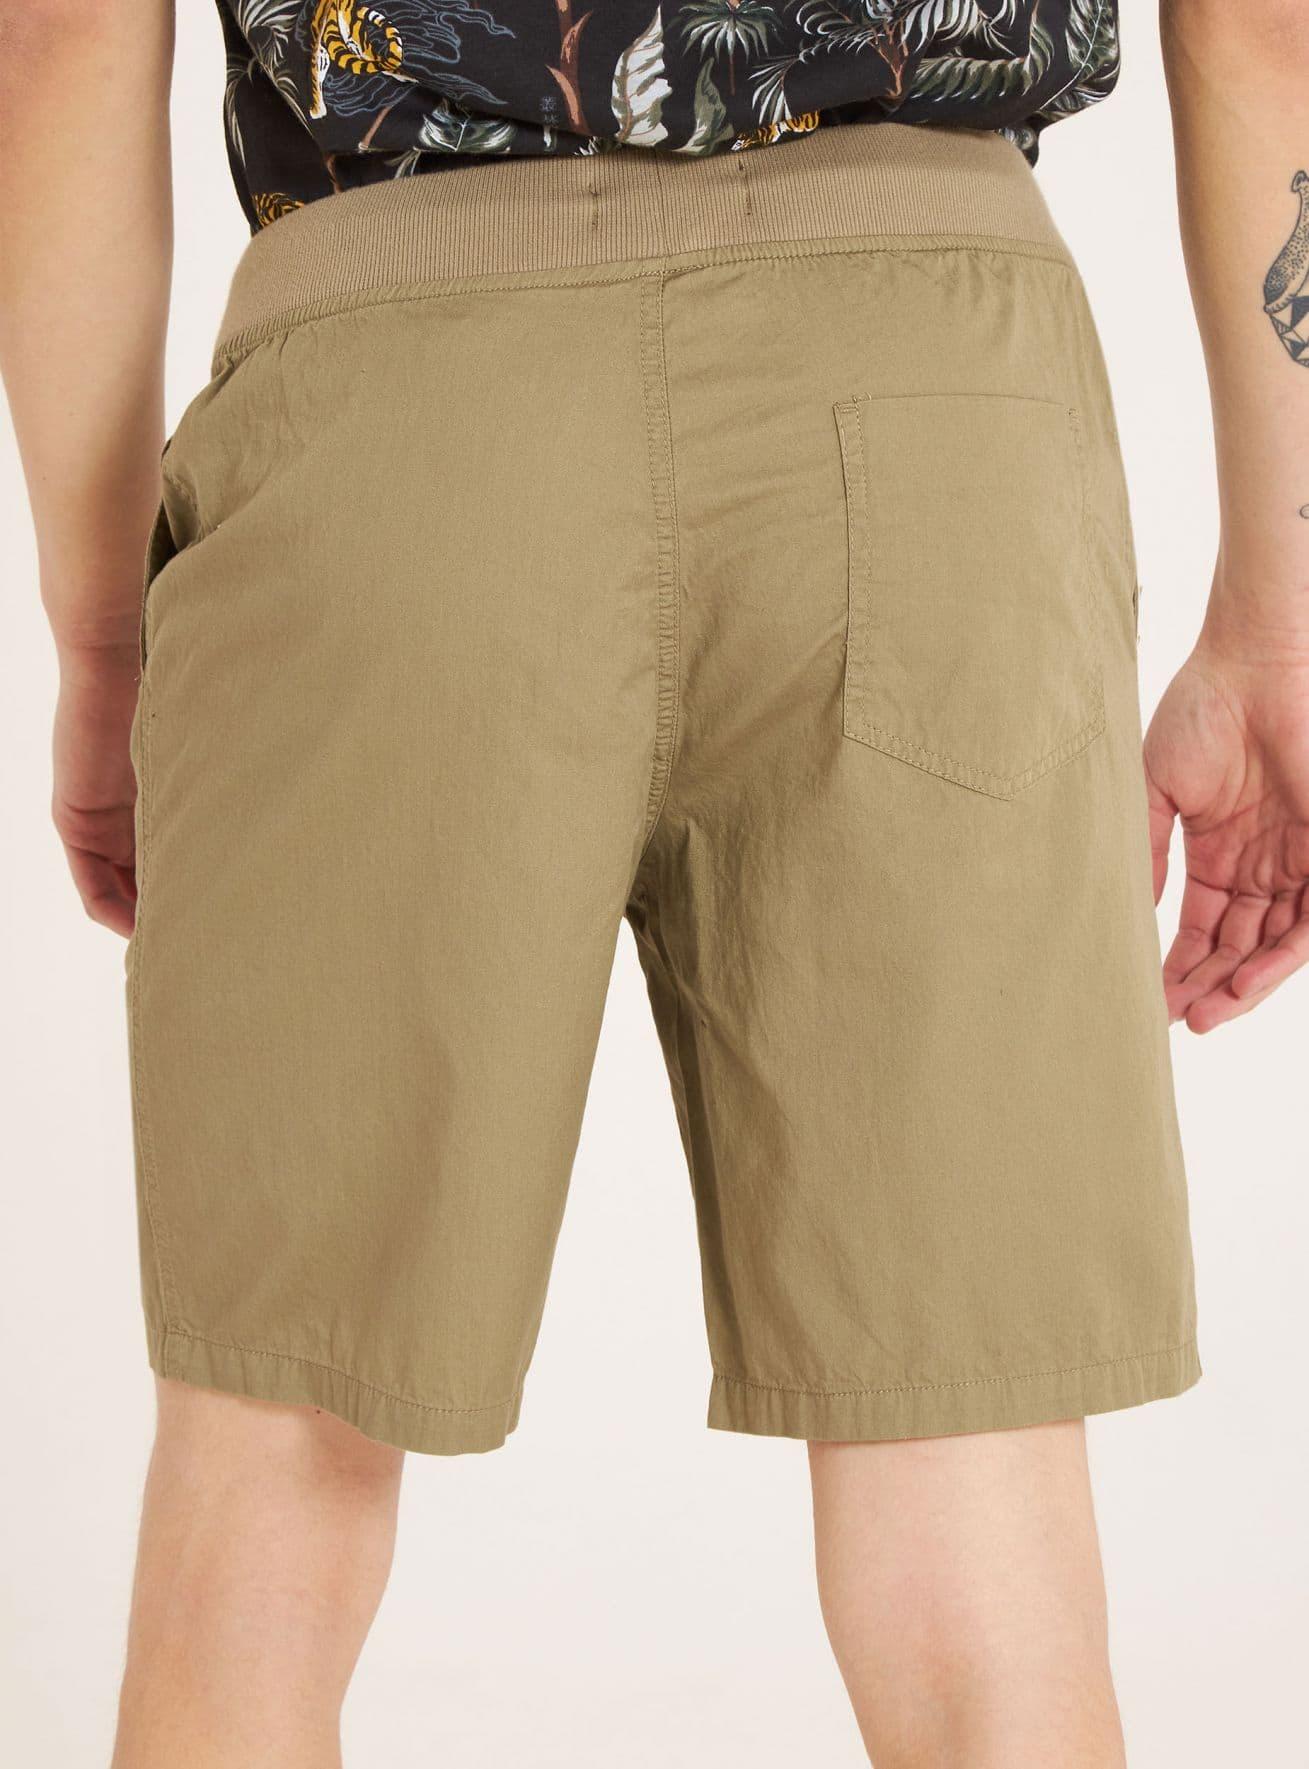 Pantalone Corto Herren Terranova